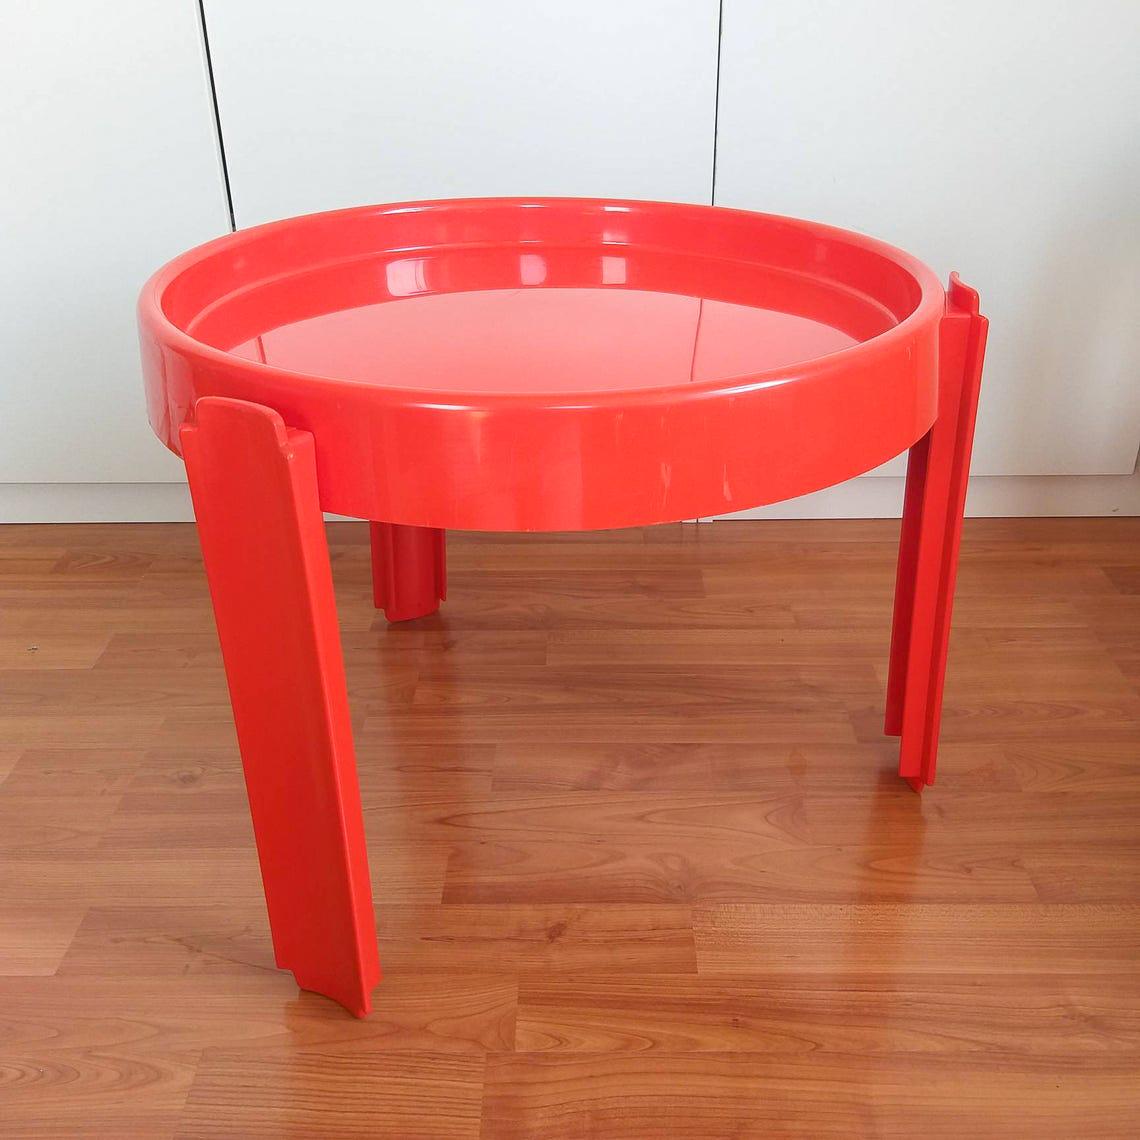 1 of 4 Rare Vintage Plastic Round Table, Mid Century Orange Table, Italian Design, Dal Vera, Space Age, Coffe Table, Italy 70s